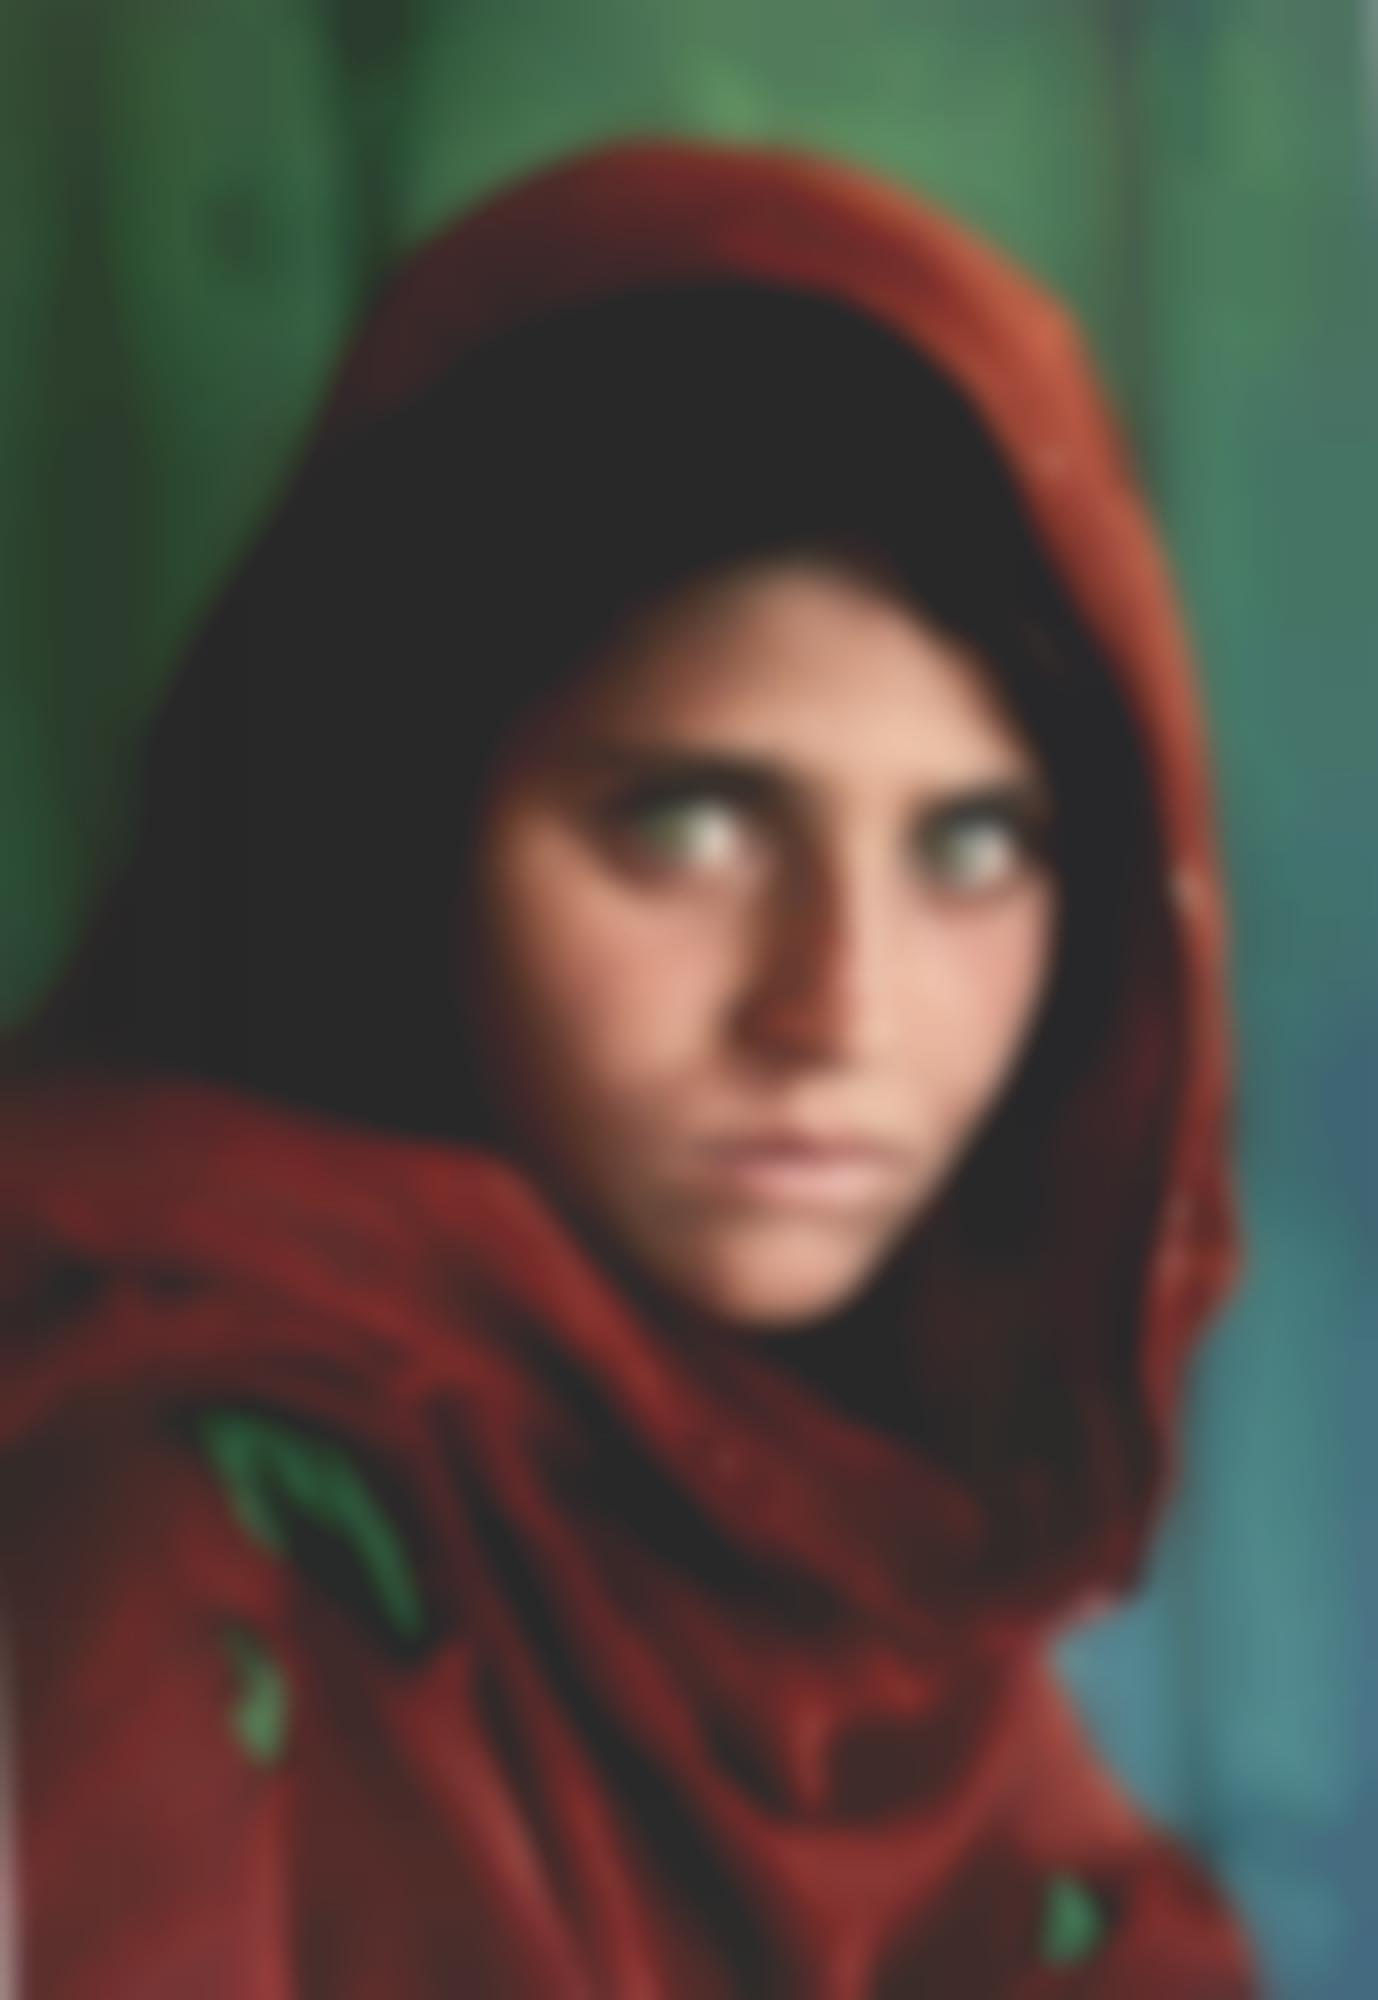 Steve McCurry-Sharbat Gula Afghan Girl Pakistan-1984